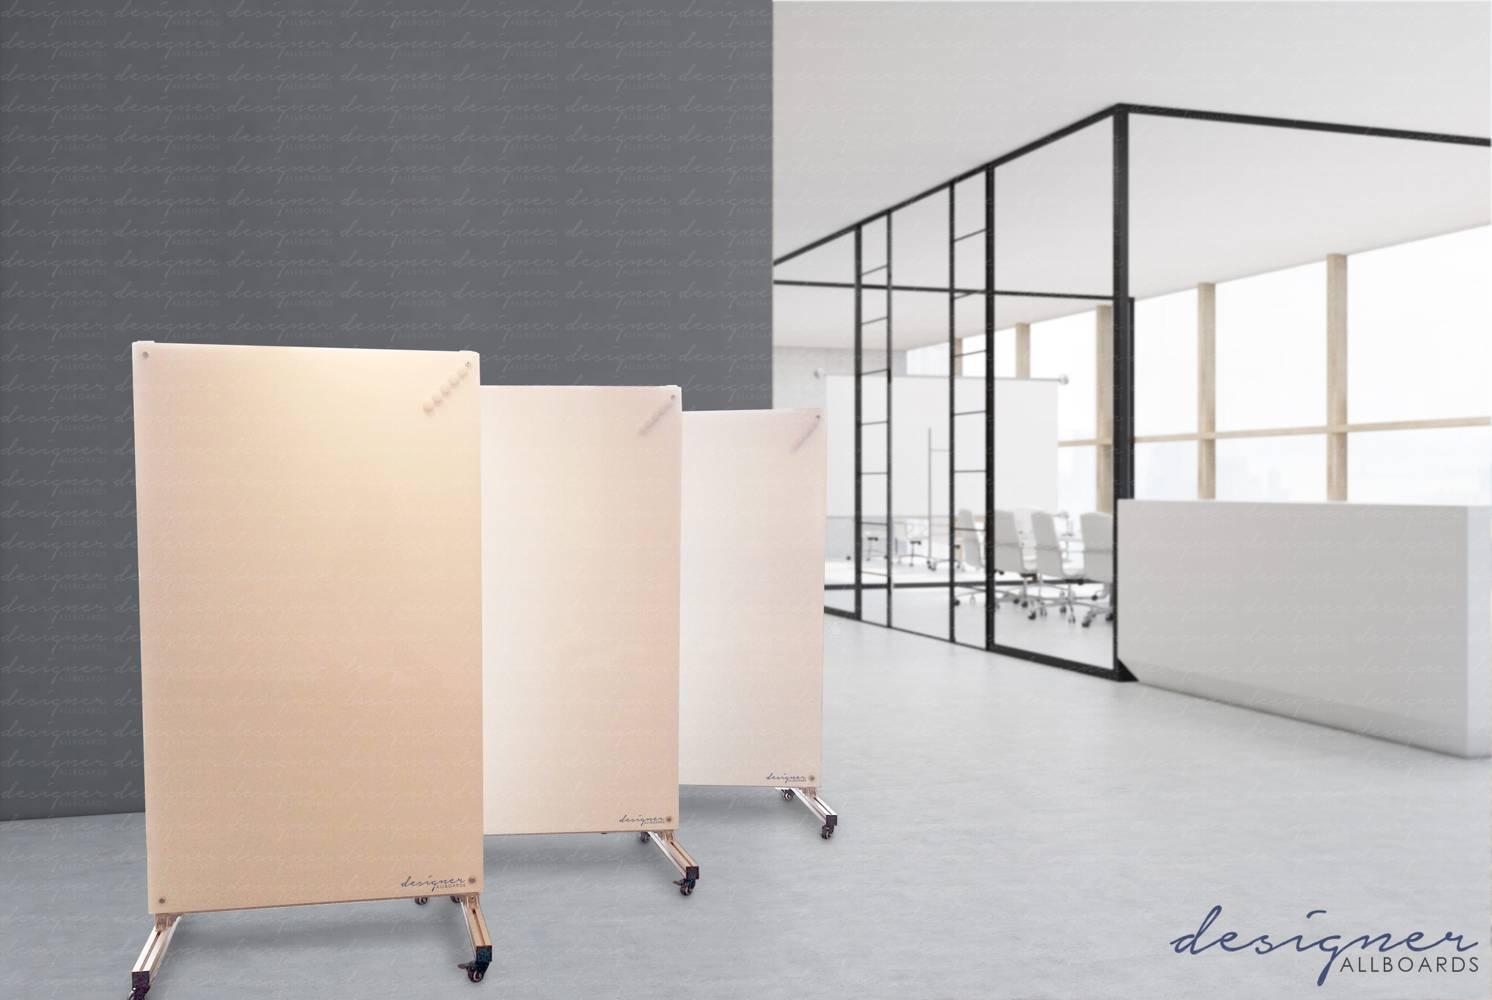 Whiteboard Gallery Designer Allboards